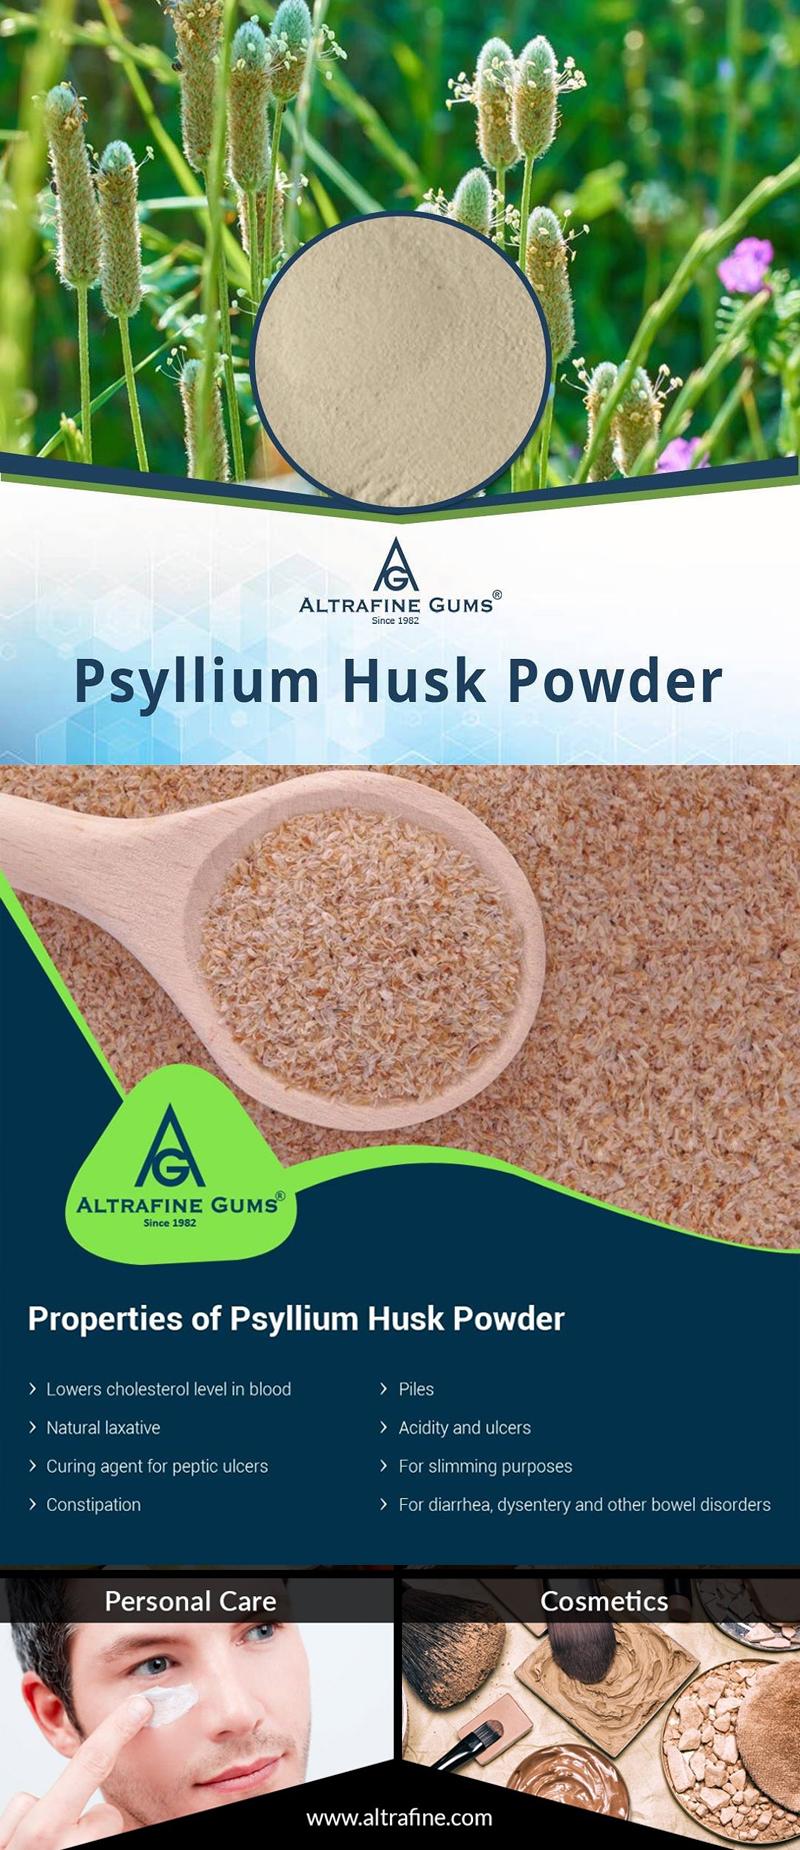 Psyllium Husk Powder Applications in Cosmetic Industry